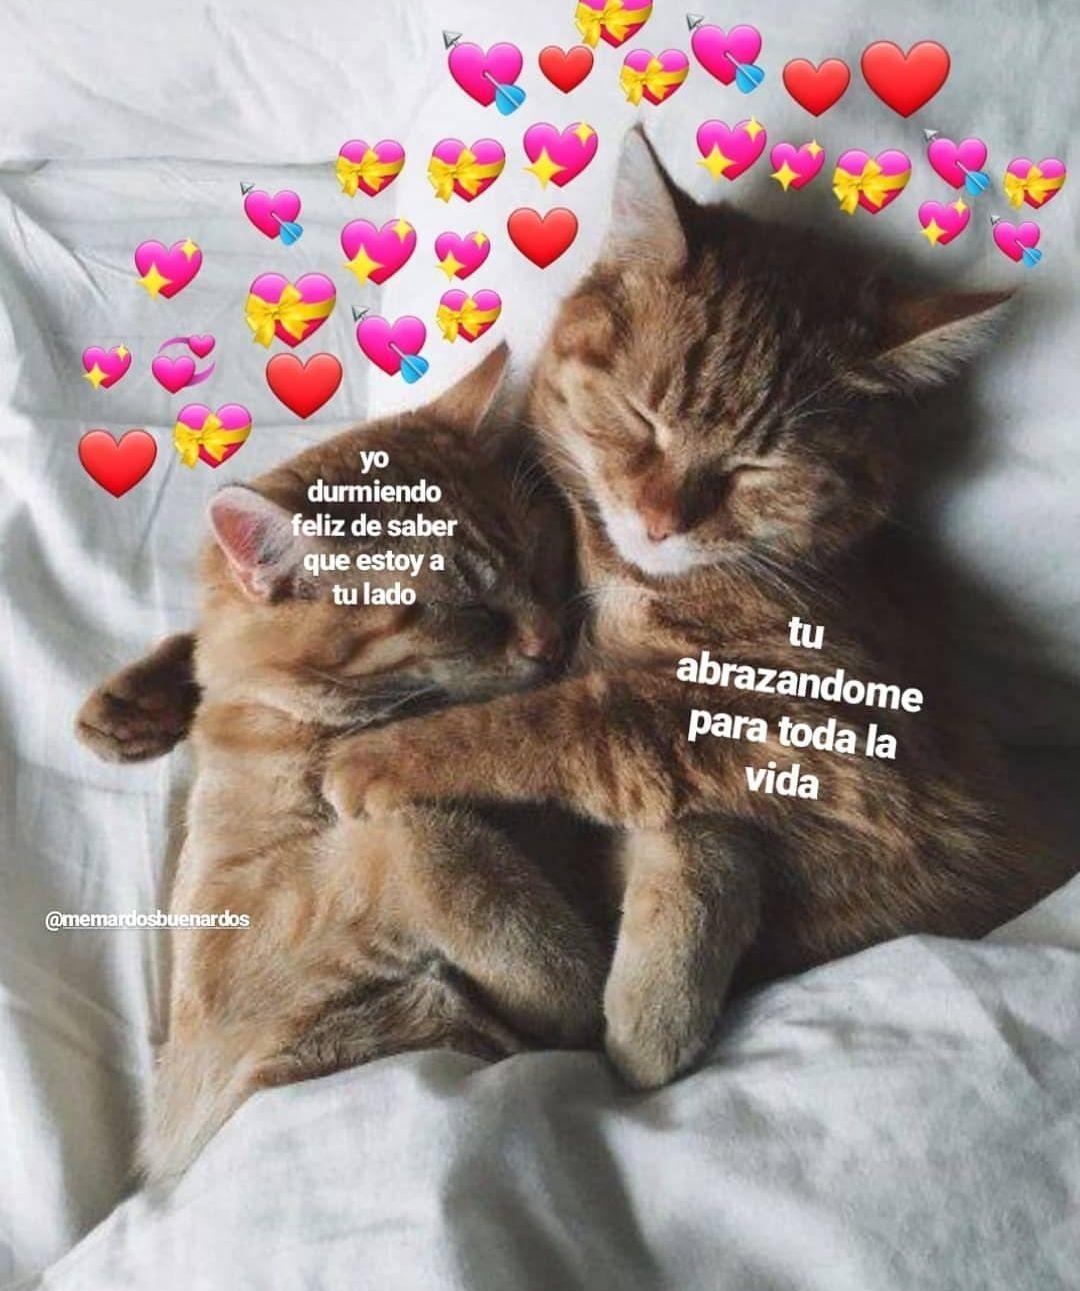 Memes Soft En 2020 Memes Lindos Memes Divertidos Meme Gato